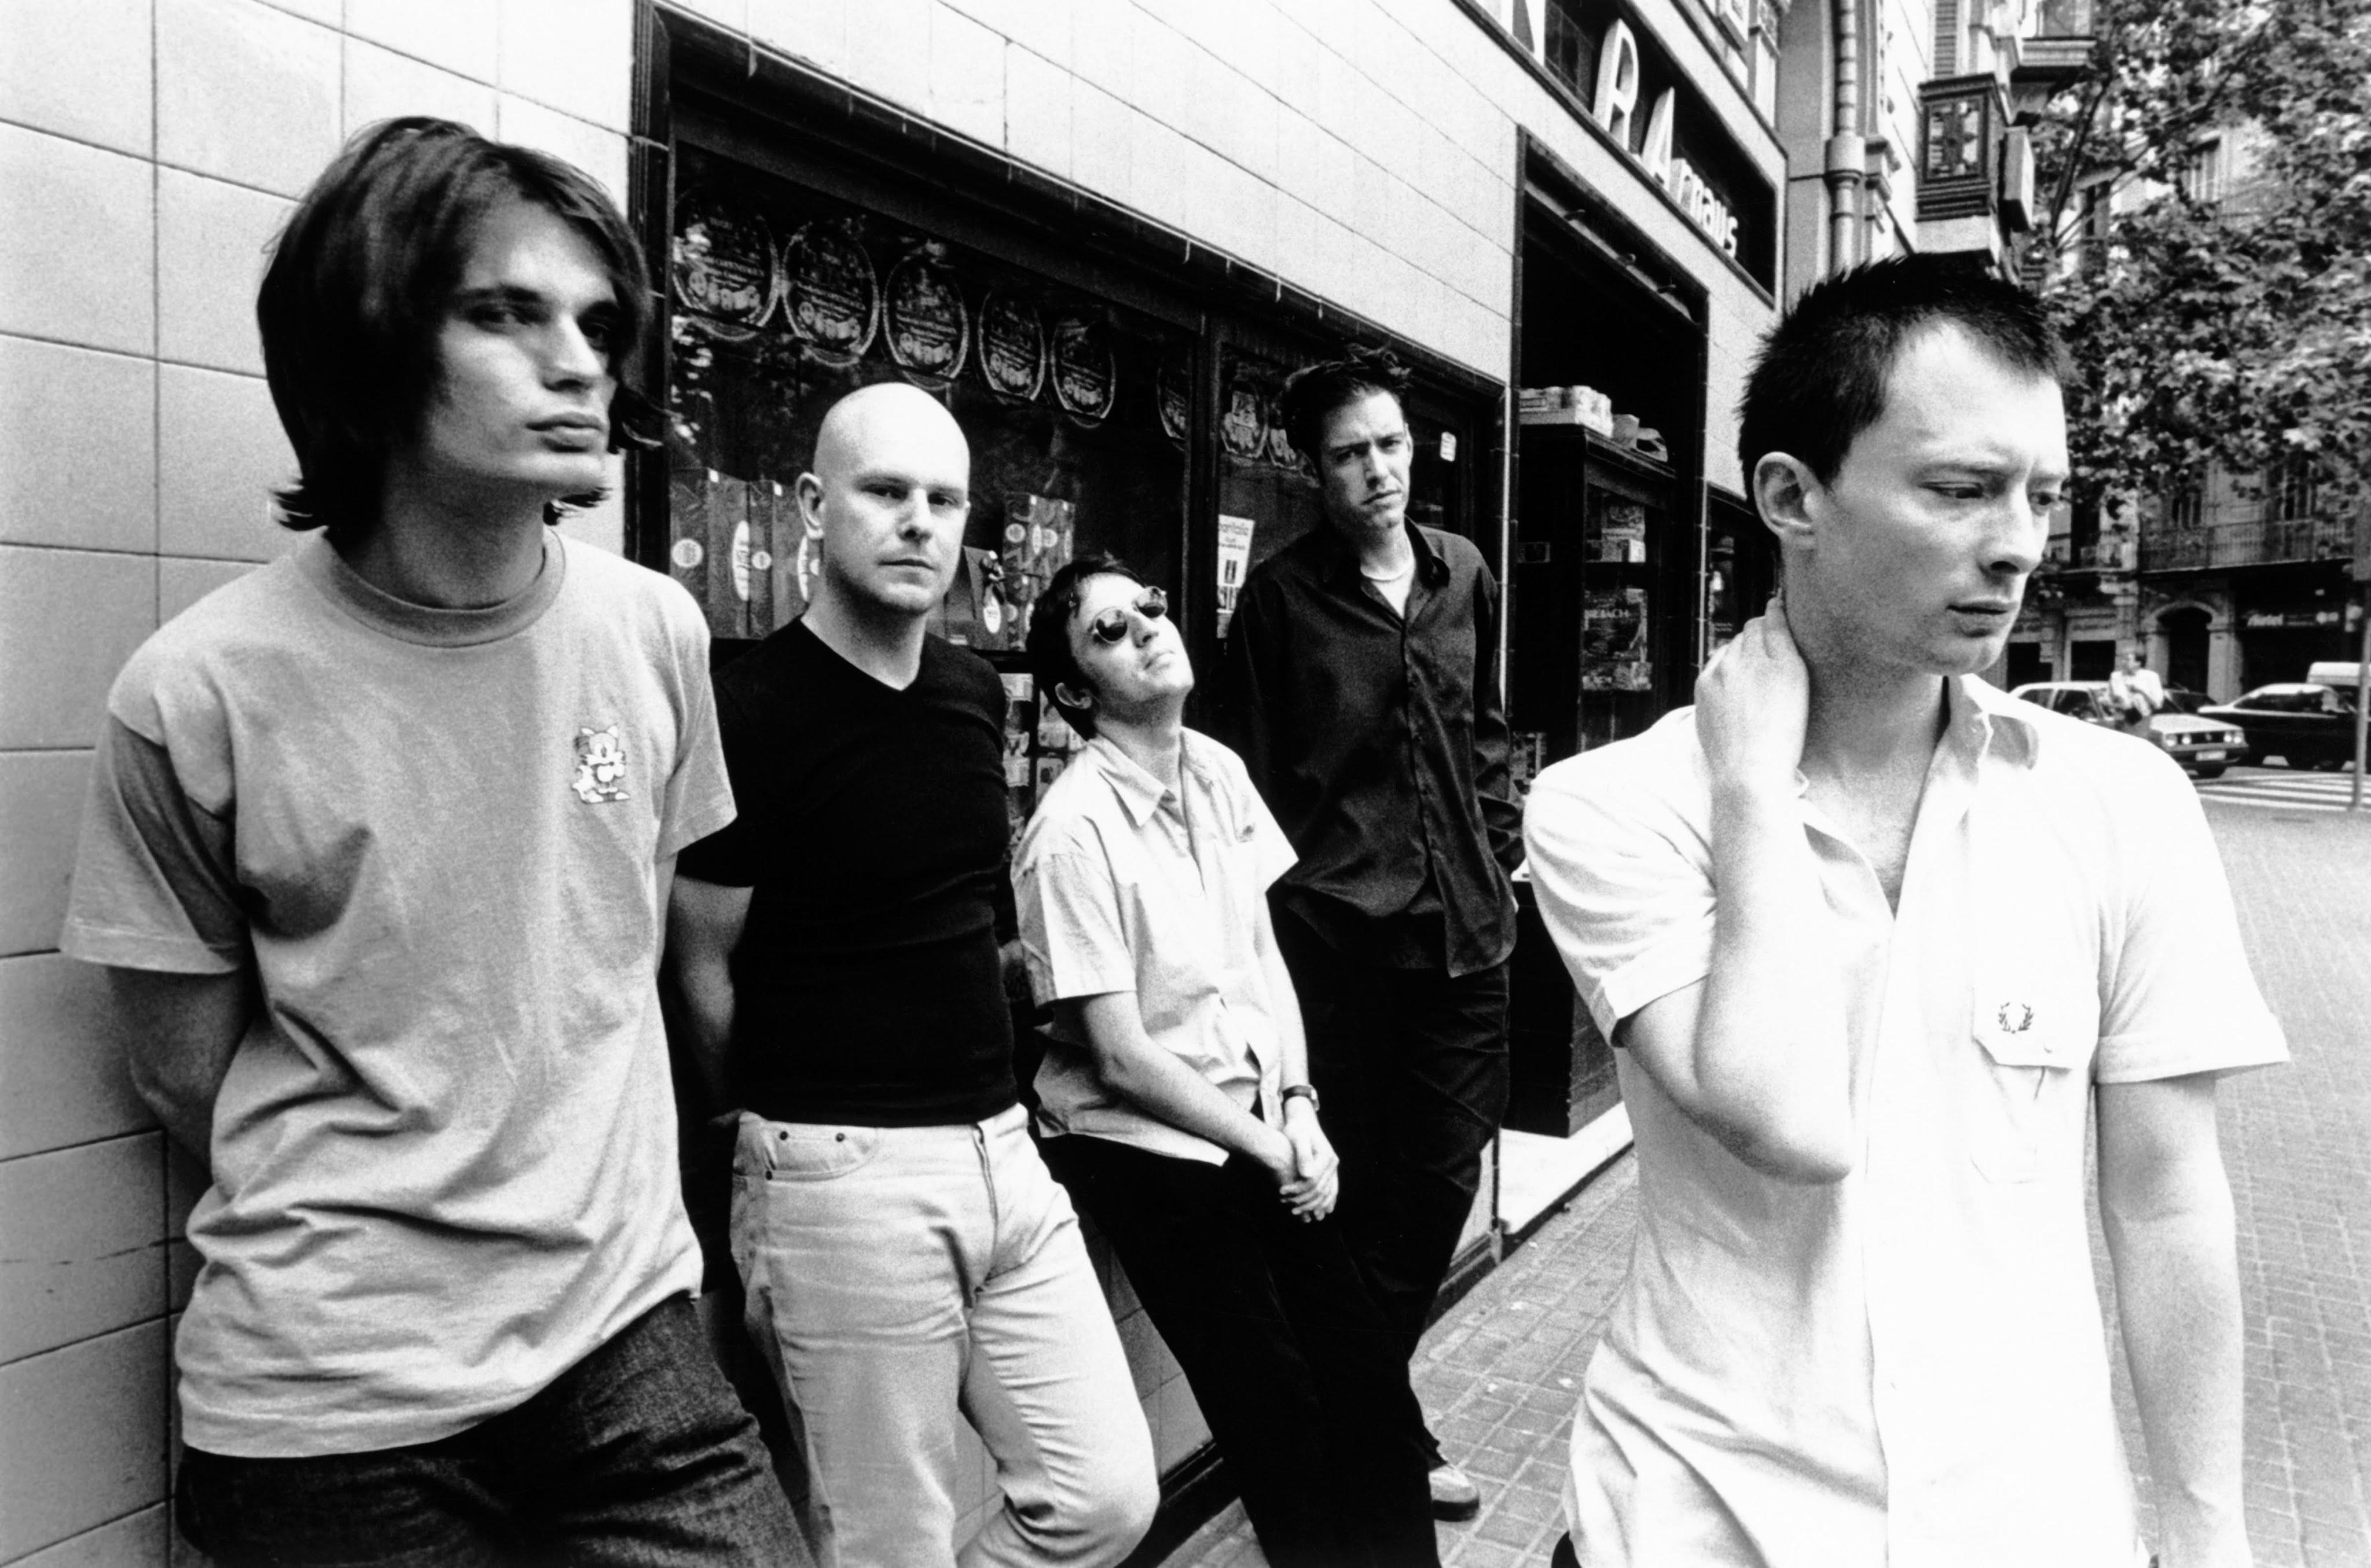 Radiohead Hd Wallpapers 7wallpapers Net